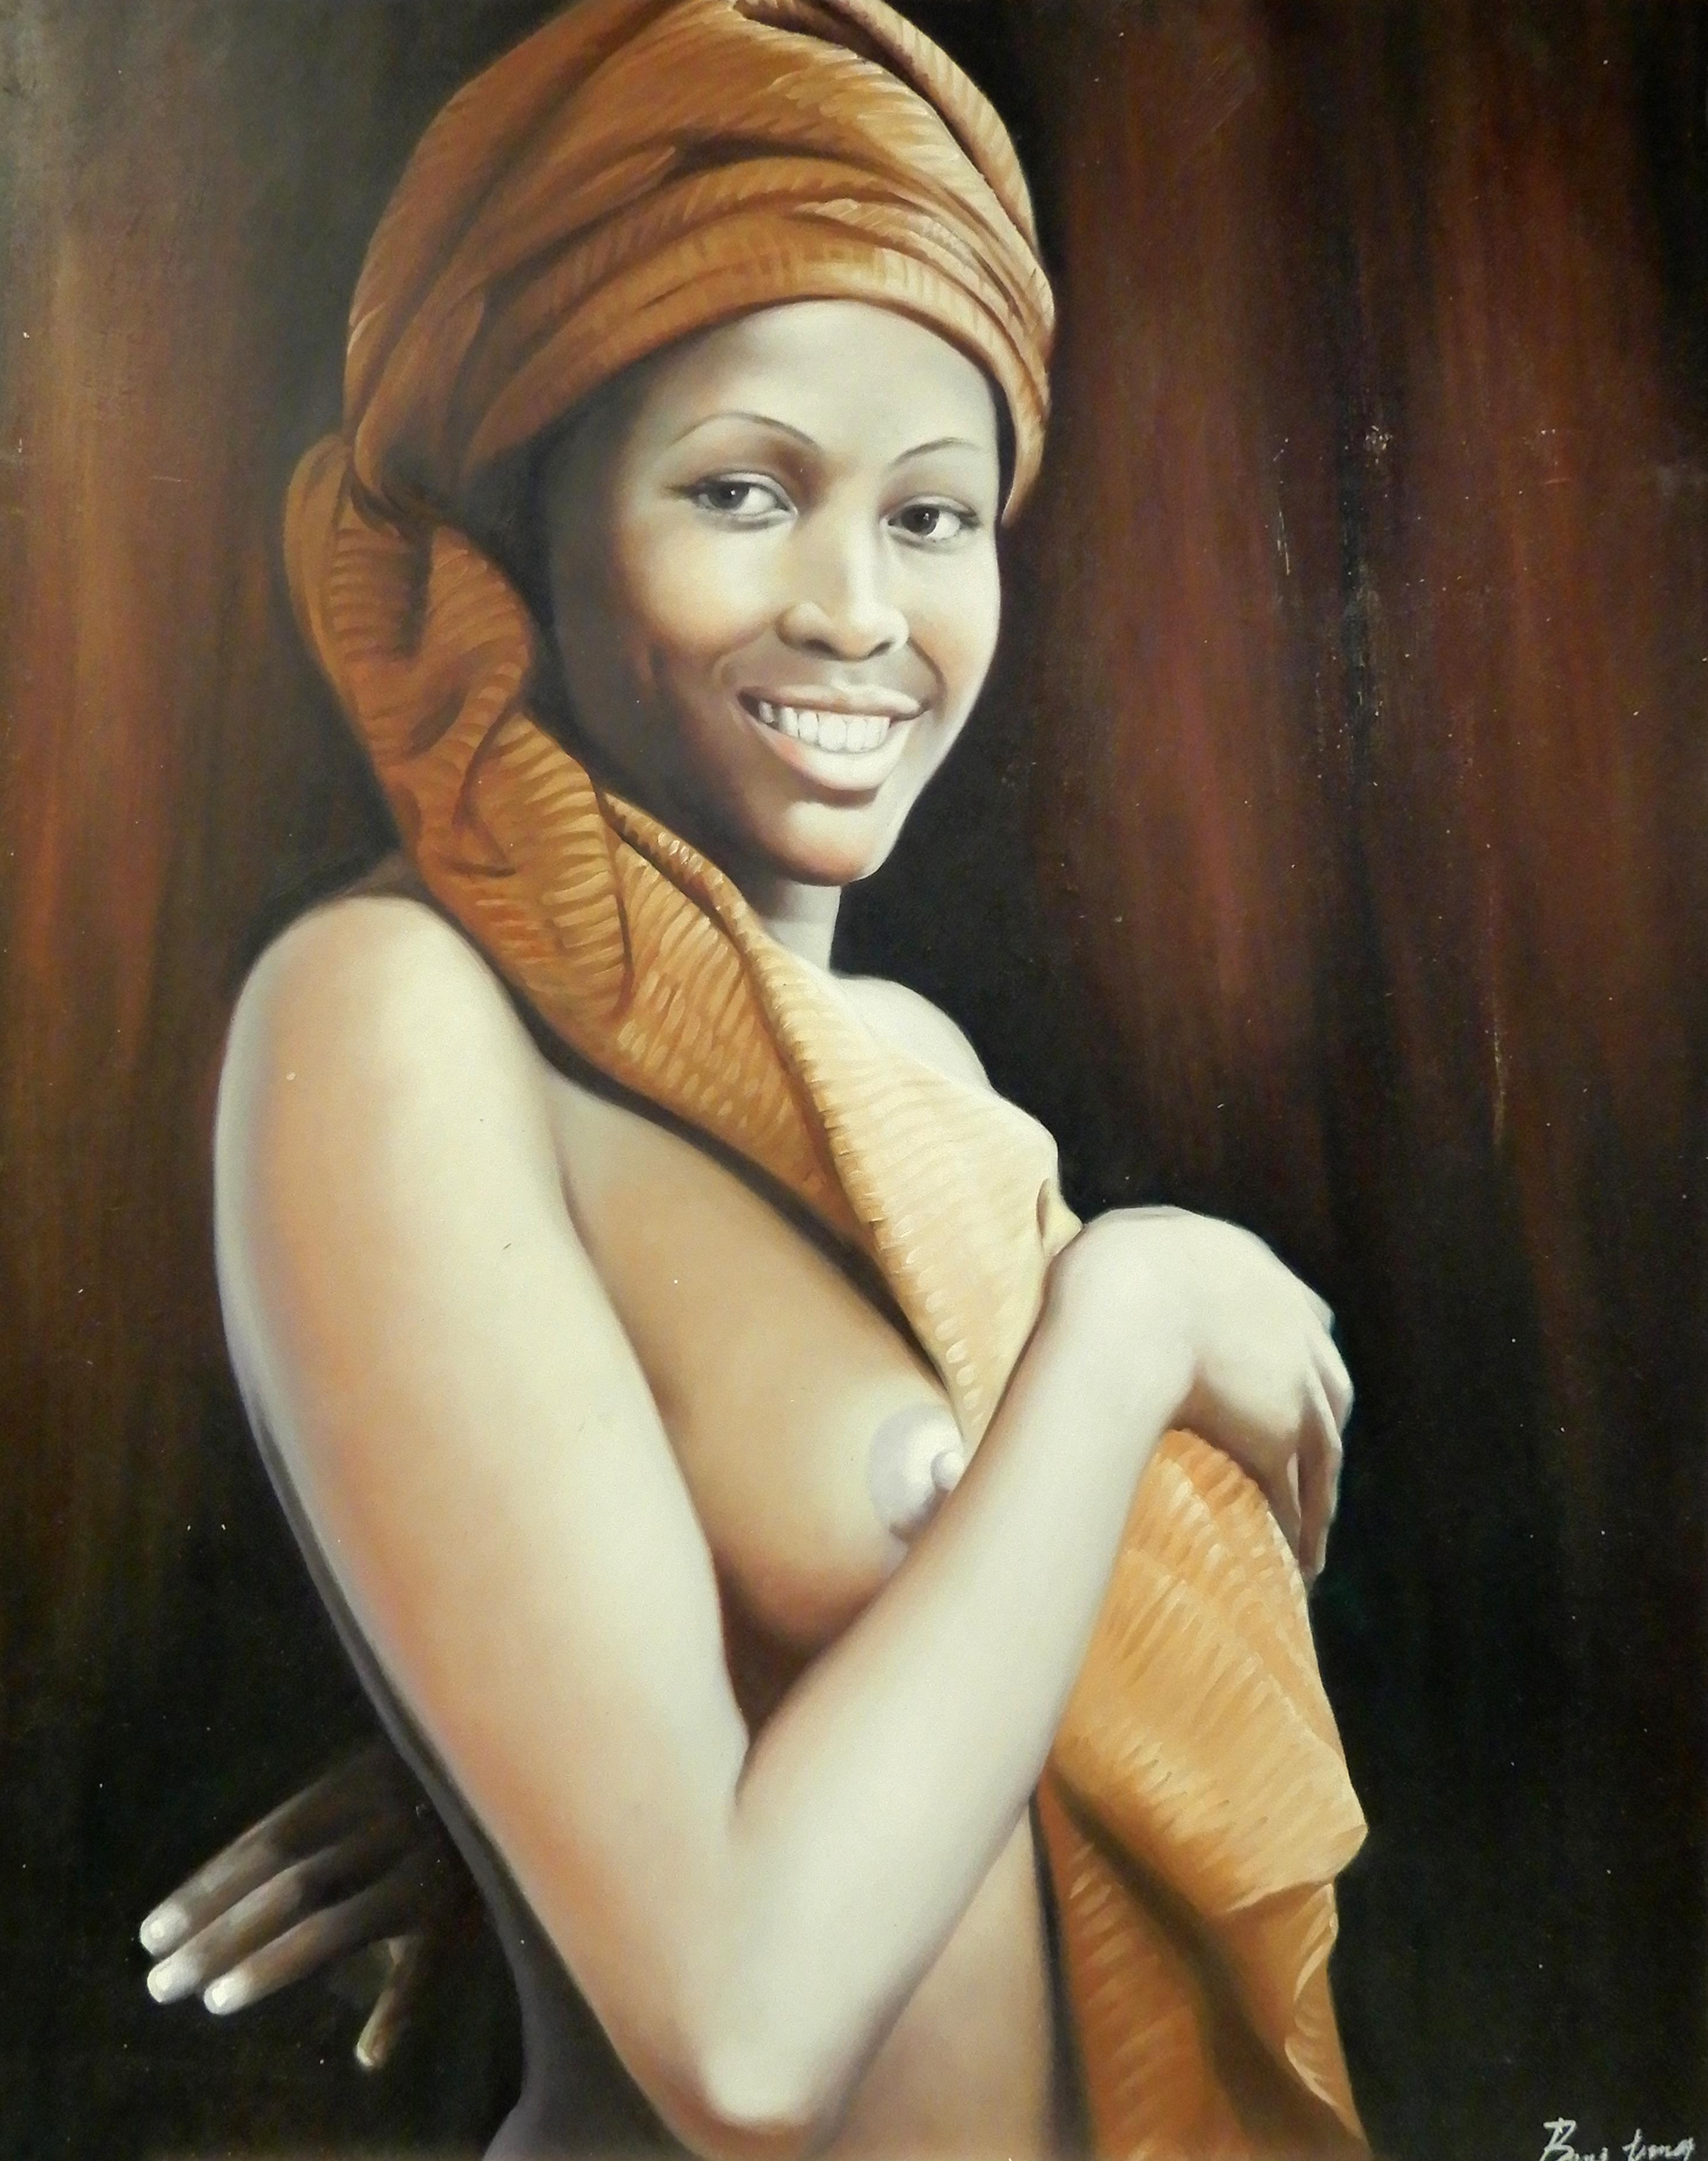 Mosafa kunstwerk schilderij